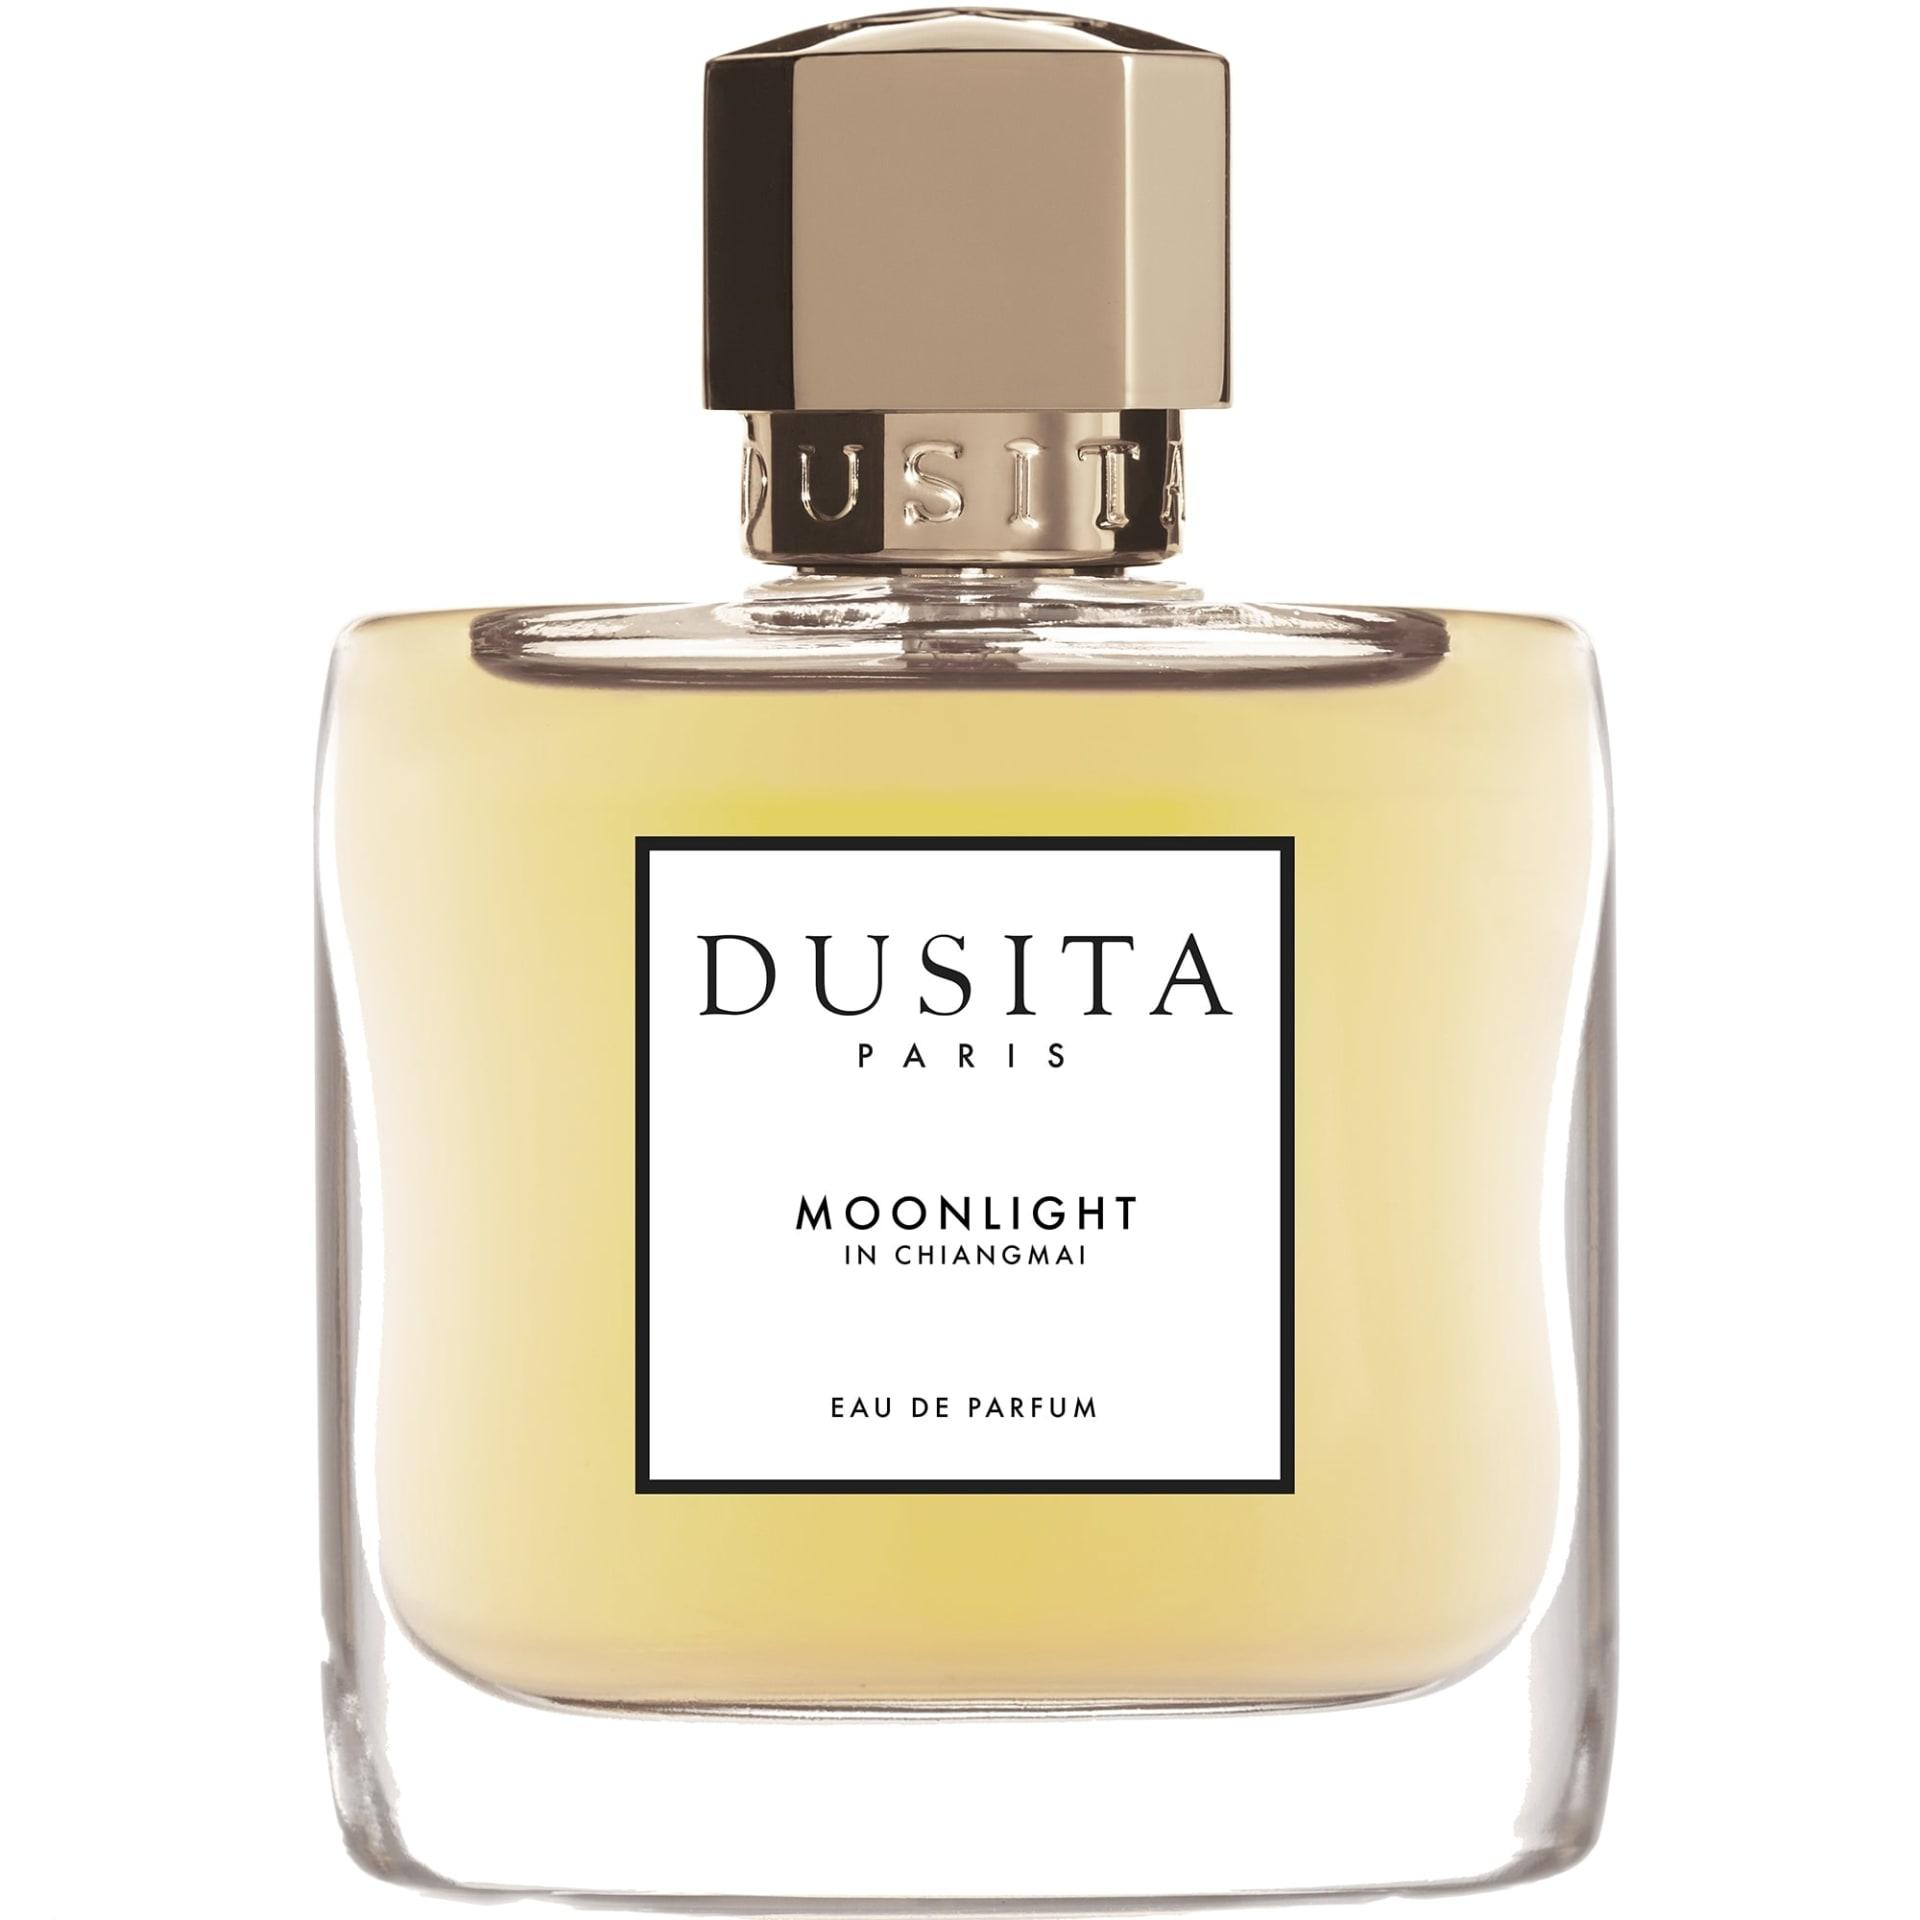 parfums-dusita-moonlight-in-chiangmai-1